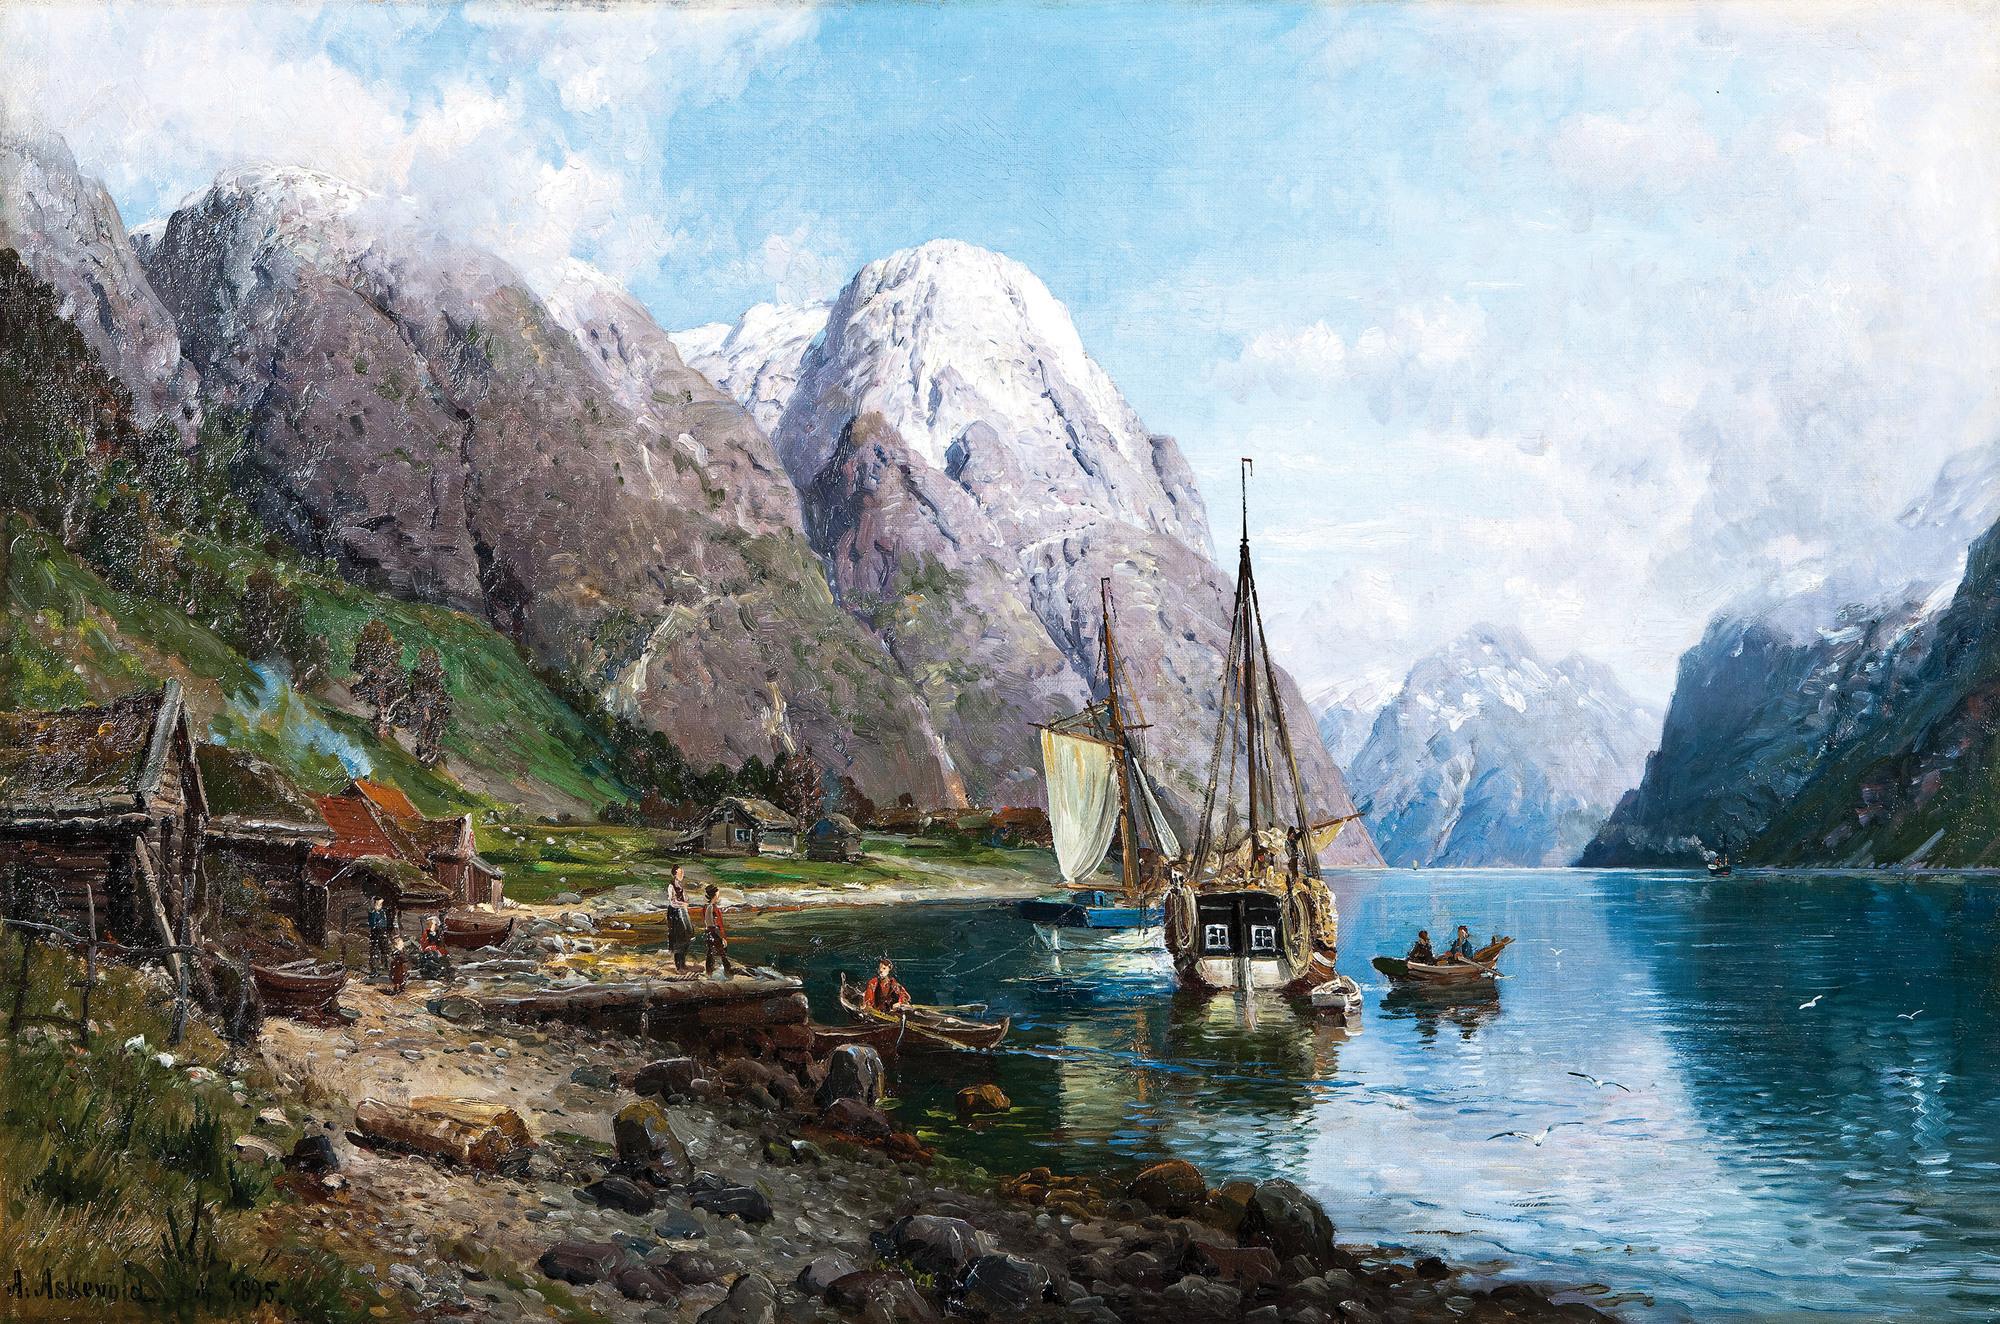 Андерс Аскевольд картина Harbor in the Sognefjord 1895 морской пейзаж масло холст